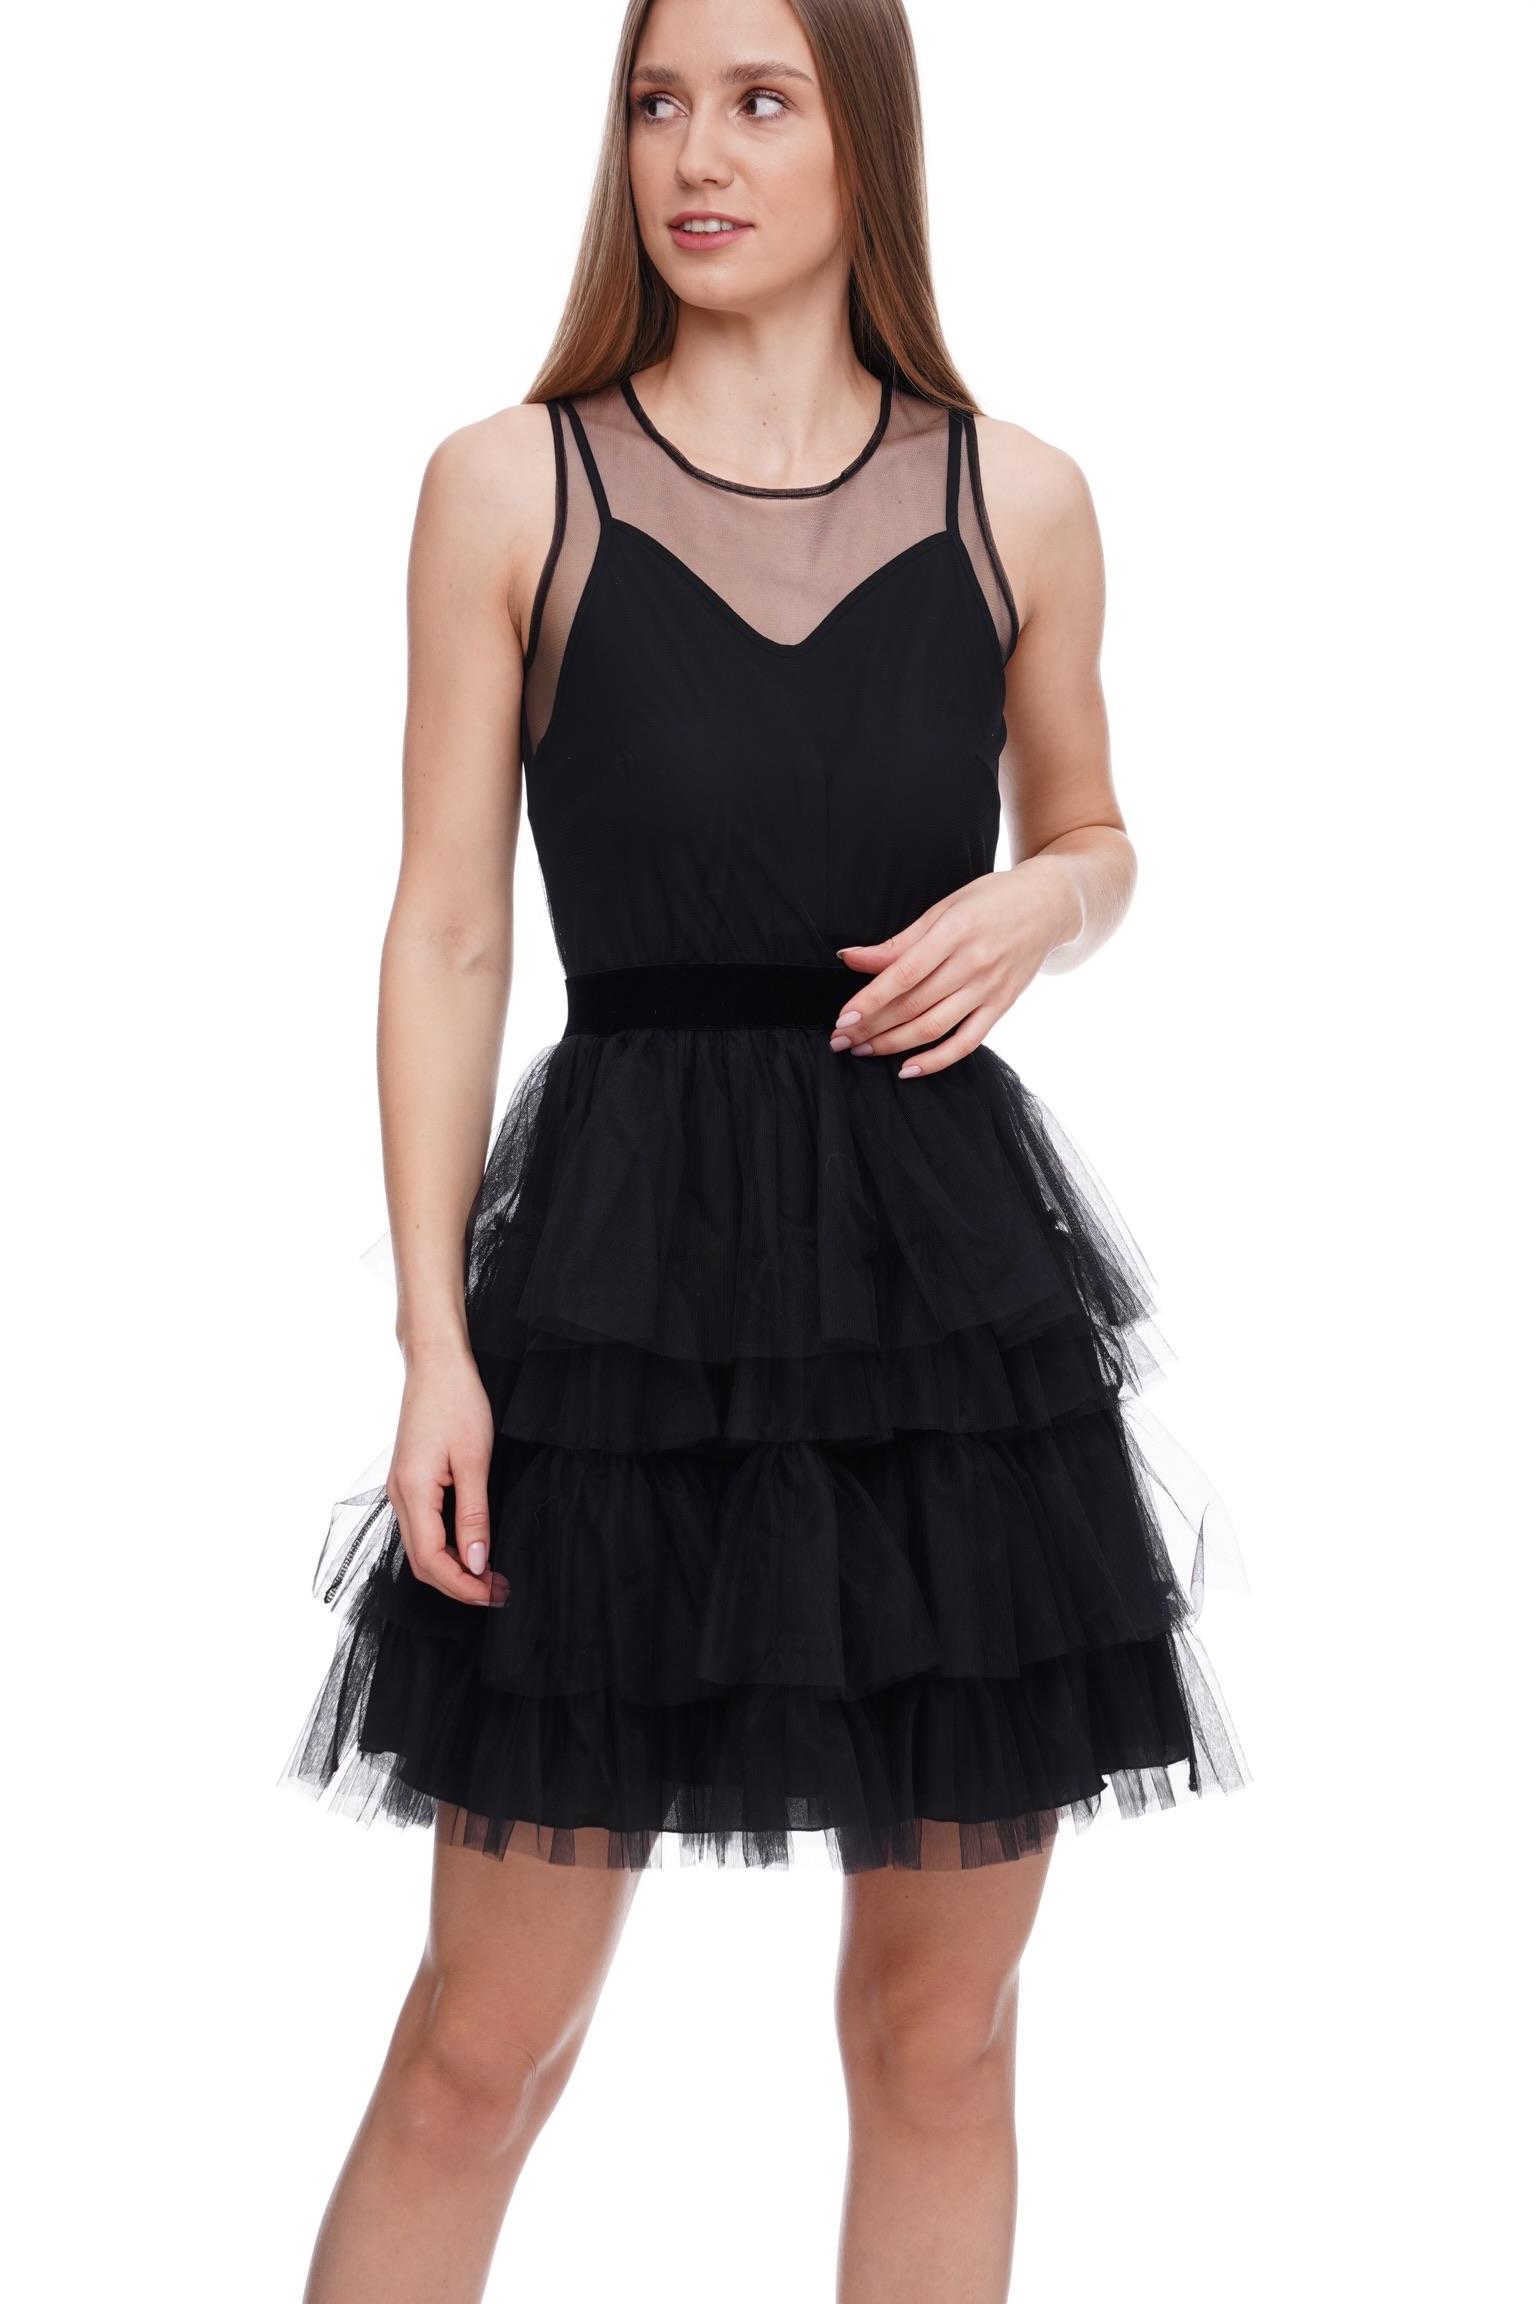 Souvenir Tüll Kleid